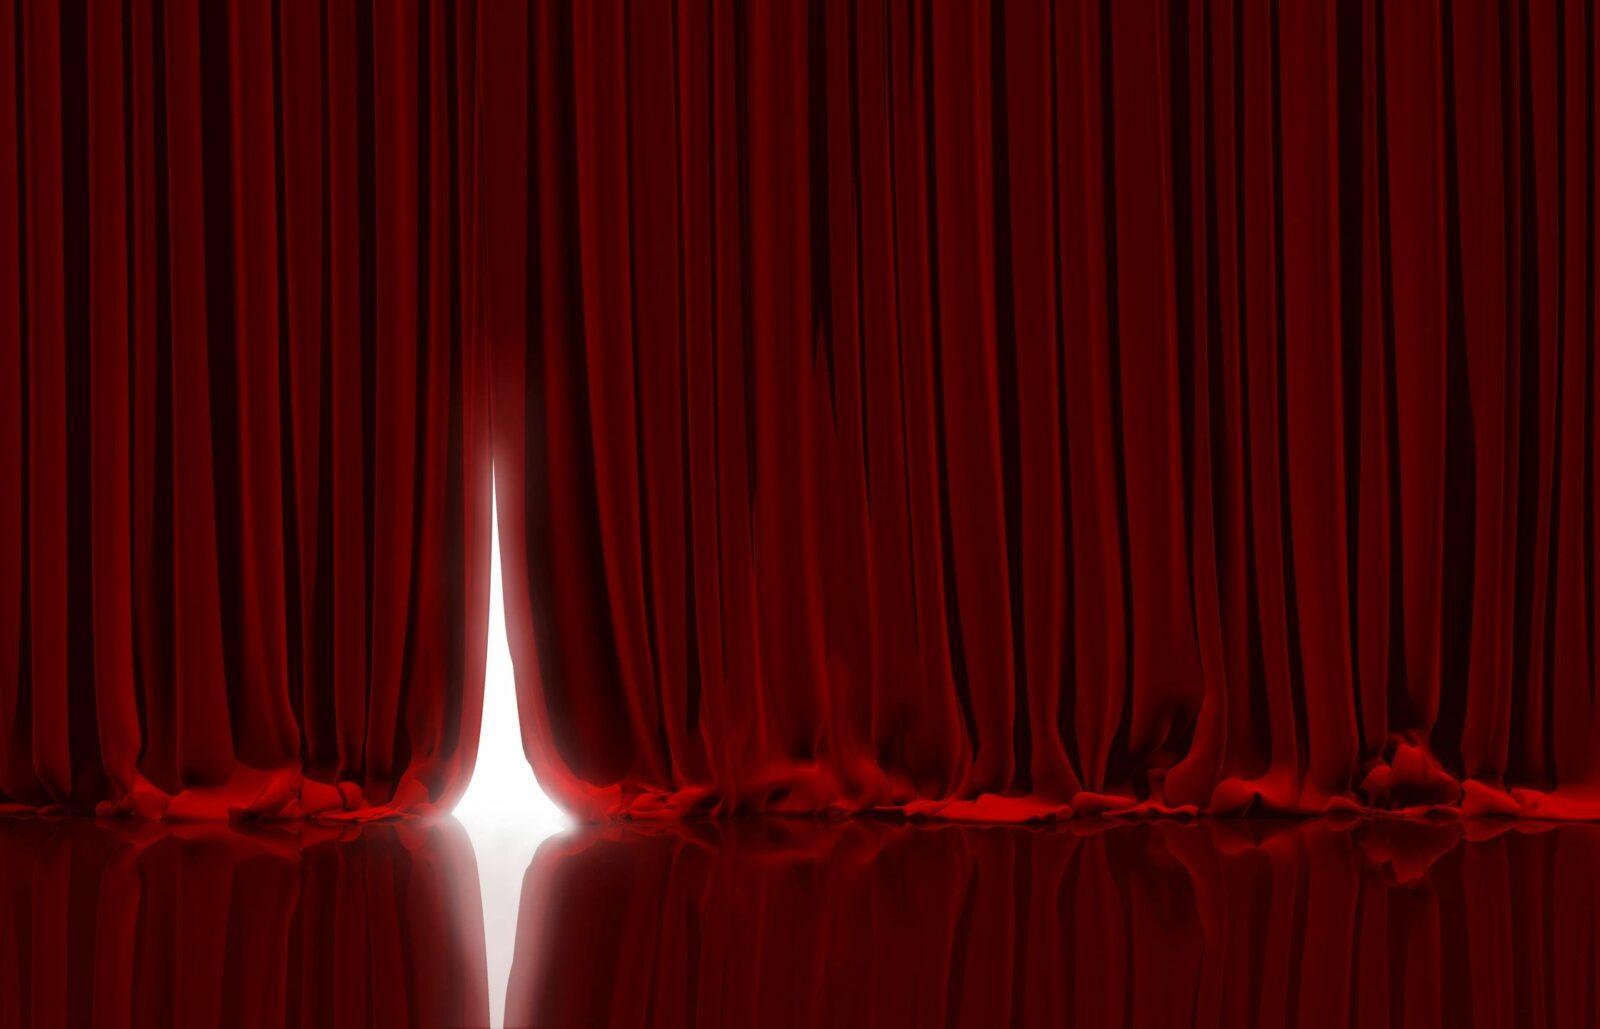 Opera Curtain